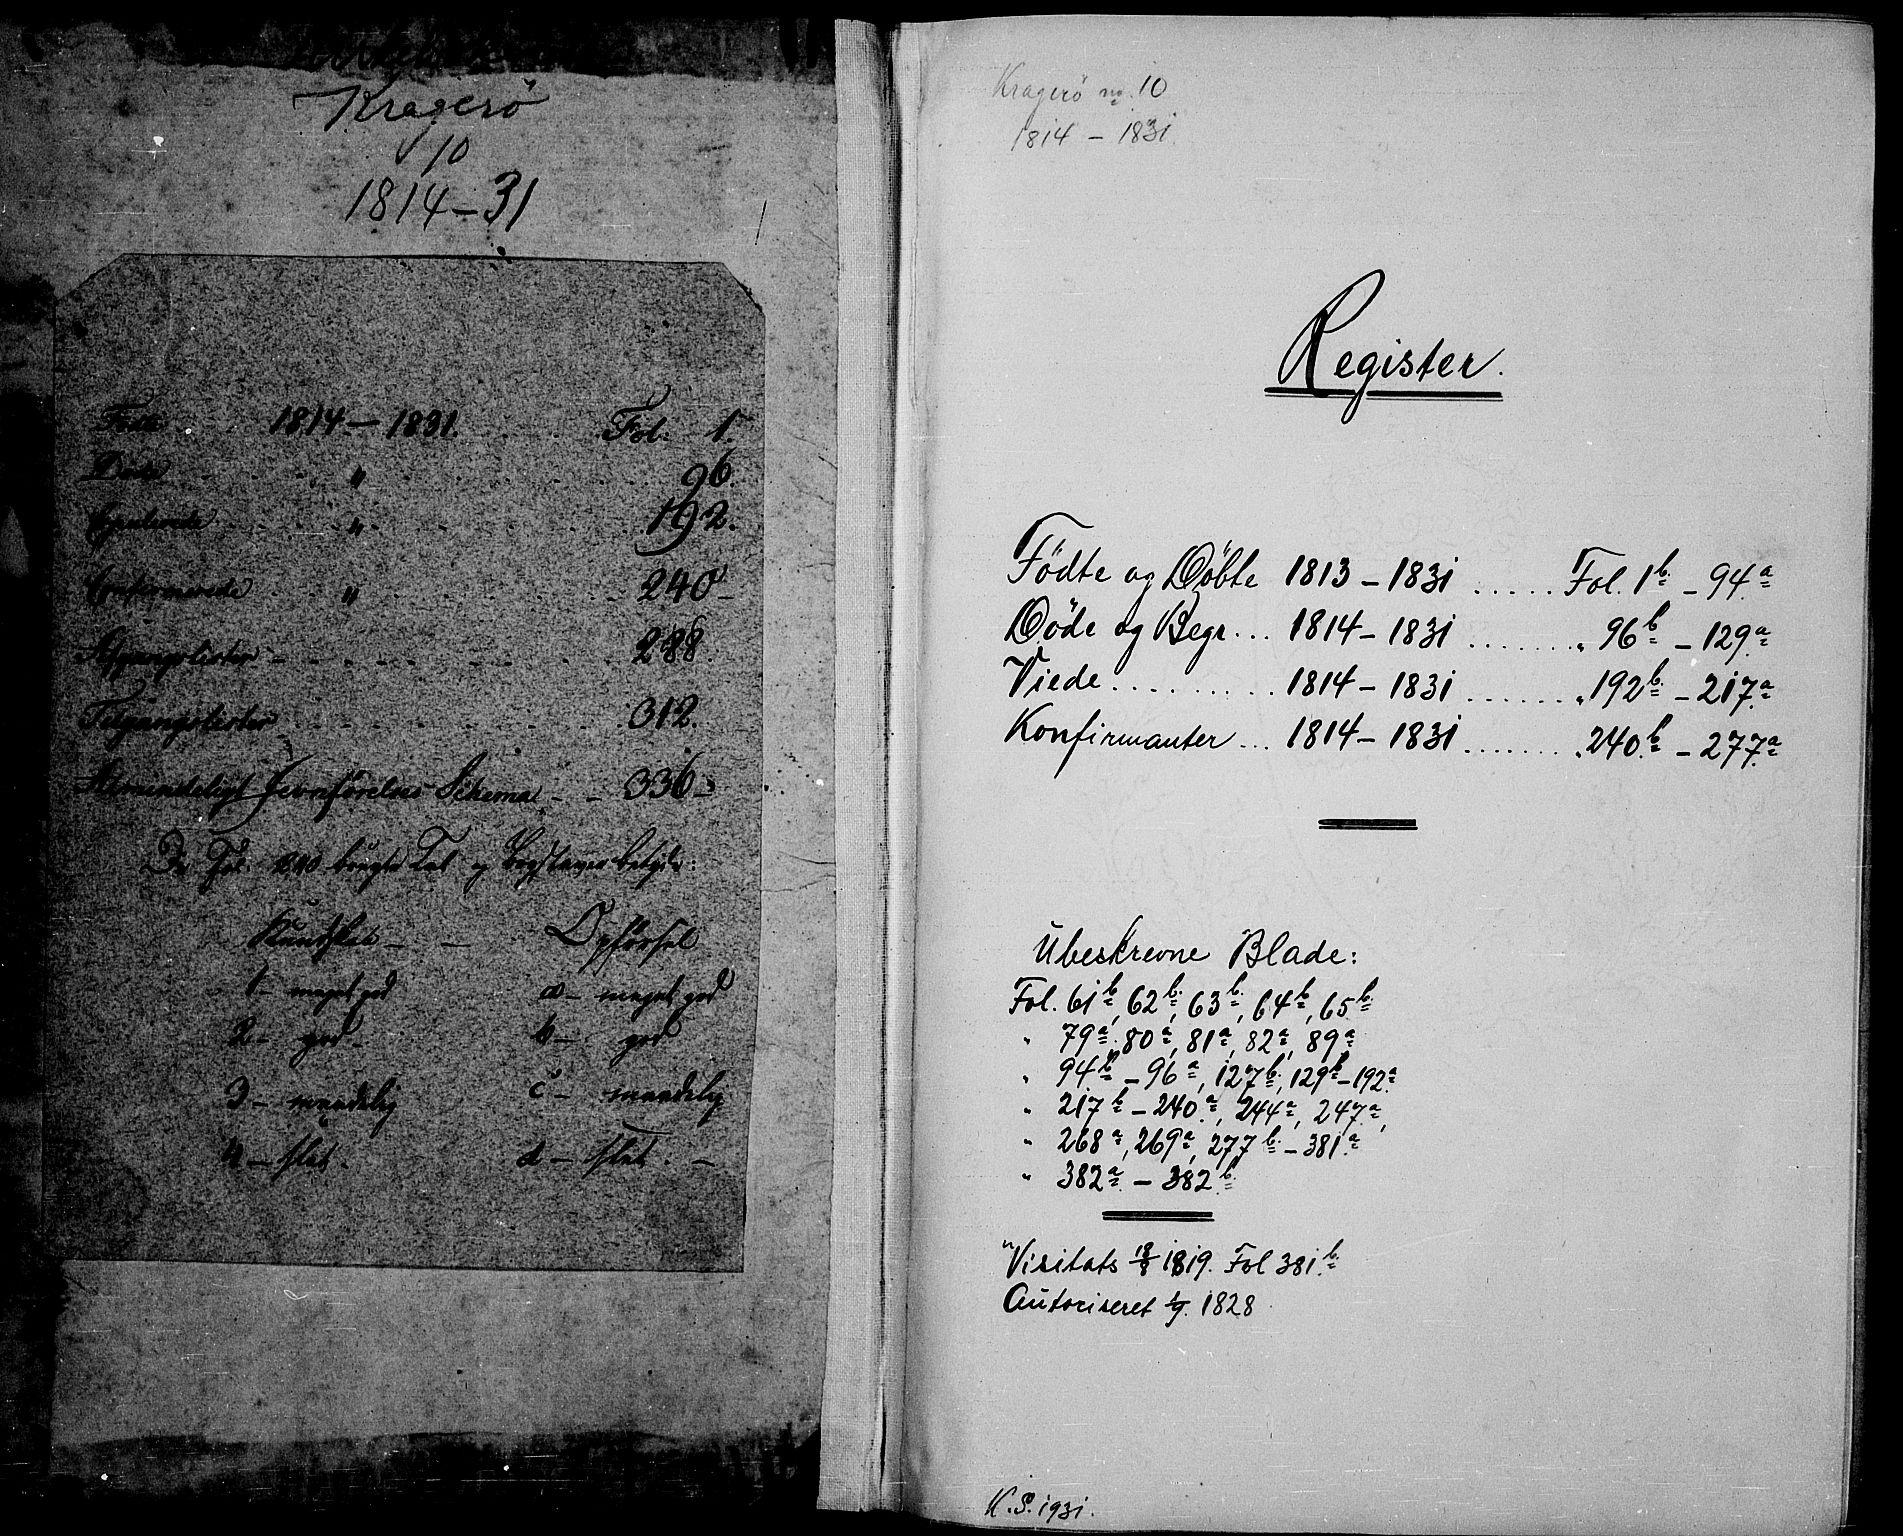 SAKO, Kragerø kirkebøker, F/Fa/L0004: Ministerialbok nr. 4, 1814-1831